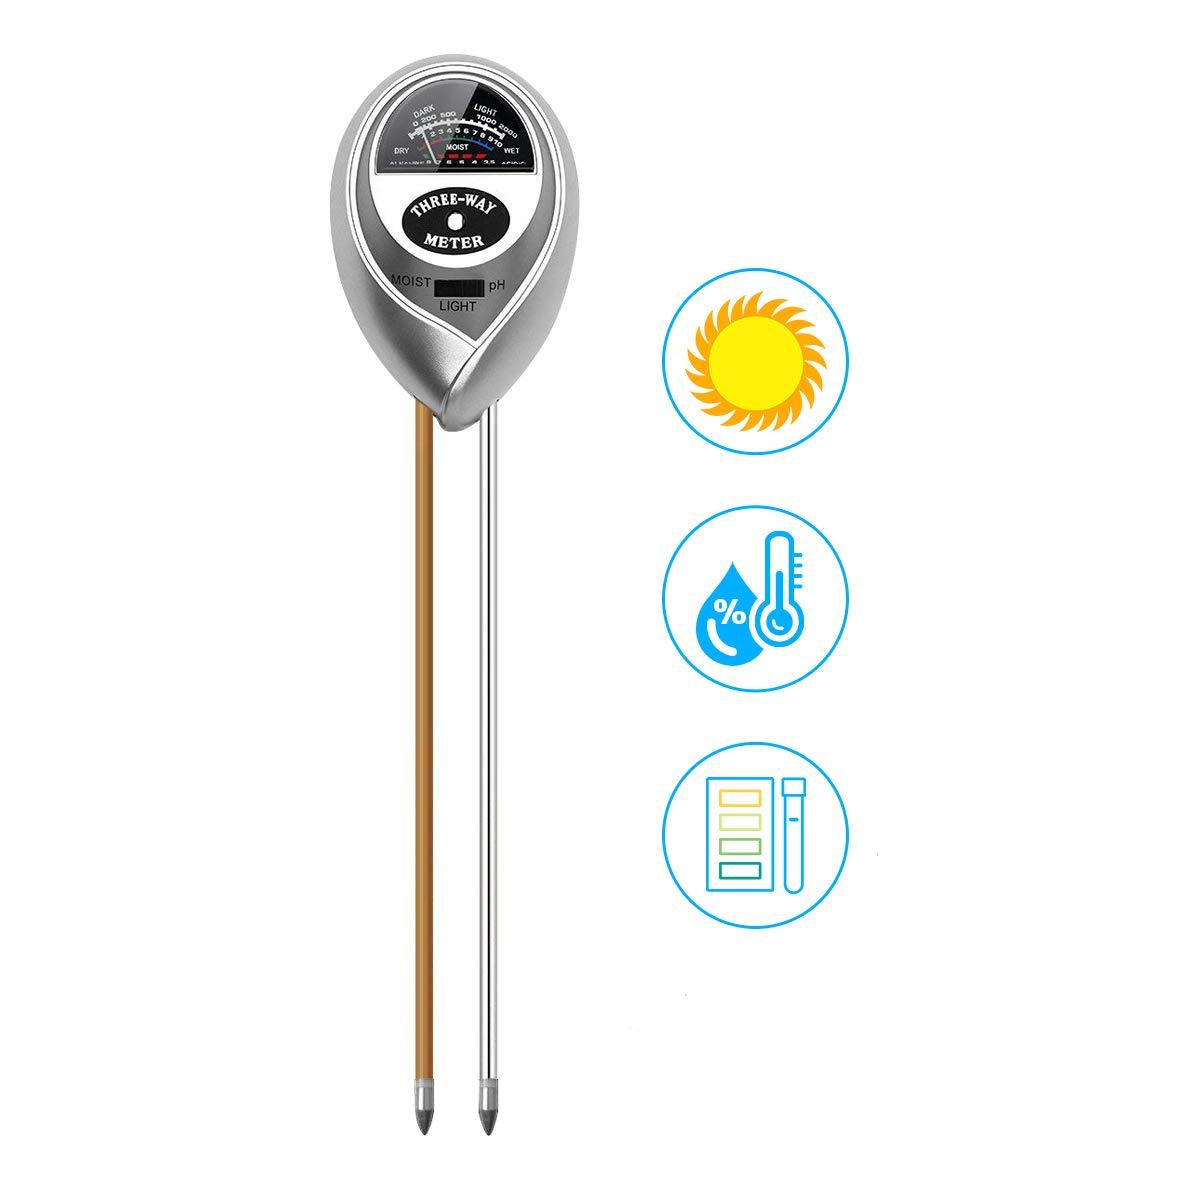 Spearmint Technology 3 in 1 Soil PH Meter Pro, Digital Soil Test Kit Soil Moisture/PH Acidity/Light/ Tester, Plant Tester Garden, Farm, Lawn, Indoor Outdoor Use Easy Read Indicator No Battery Needed